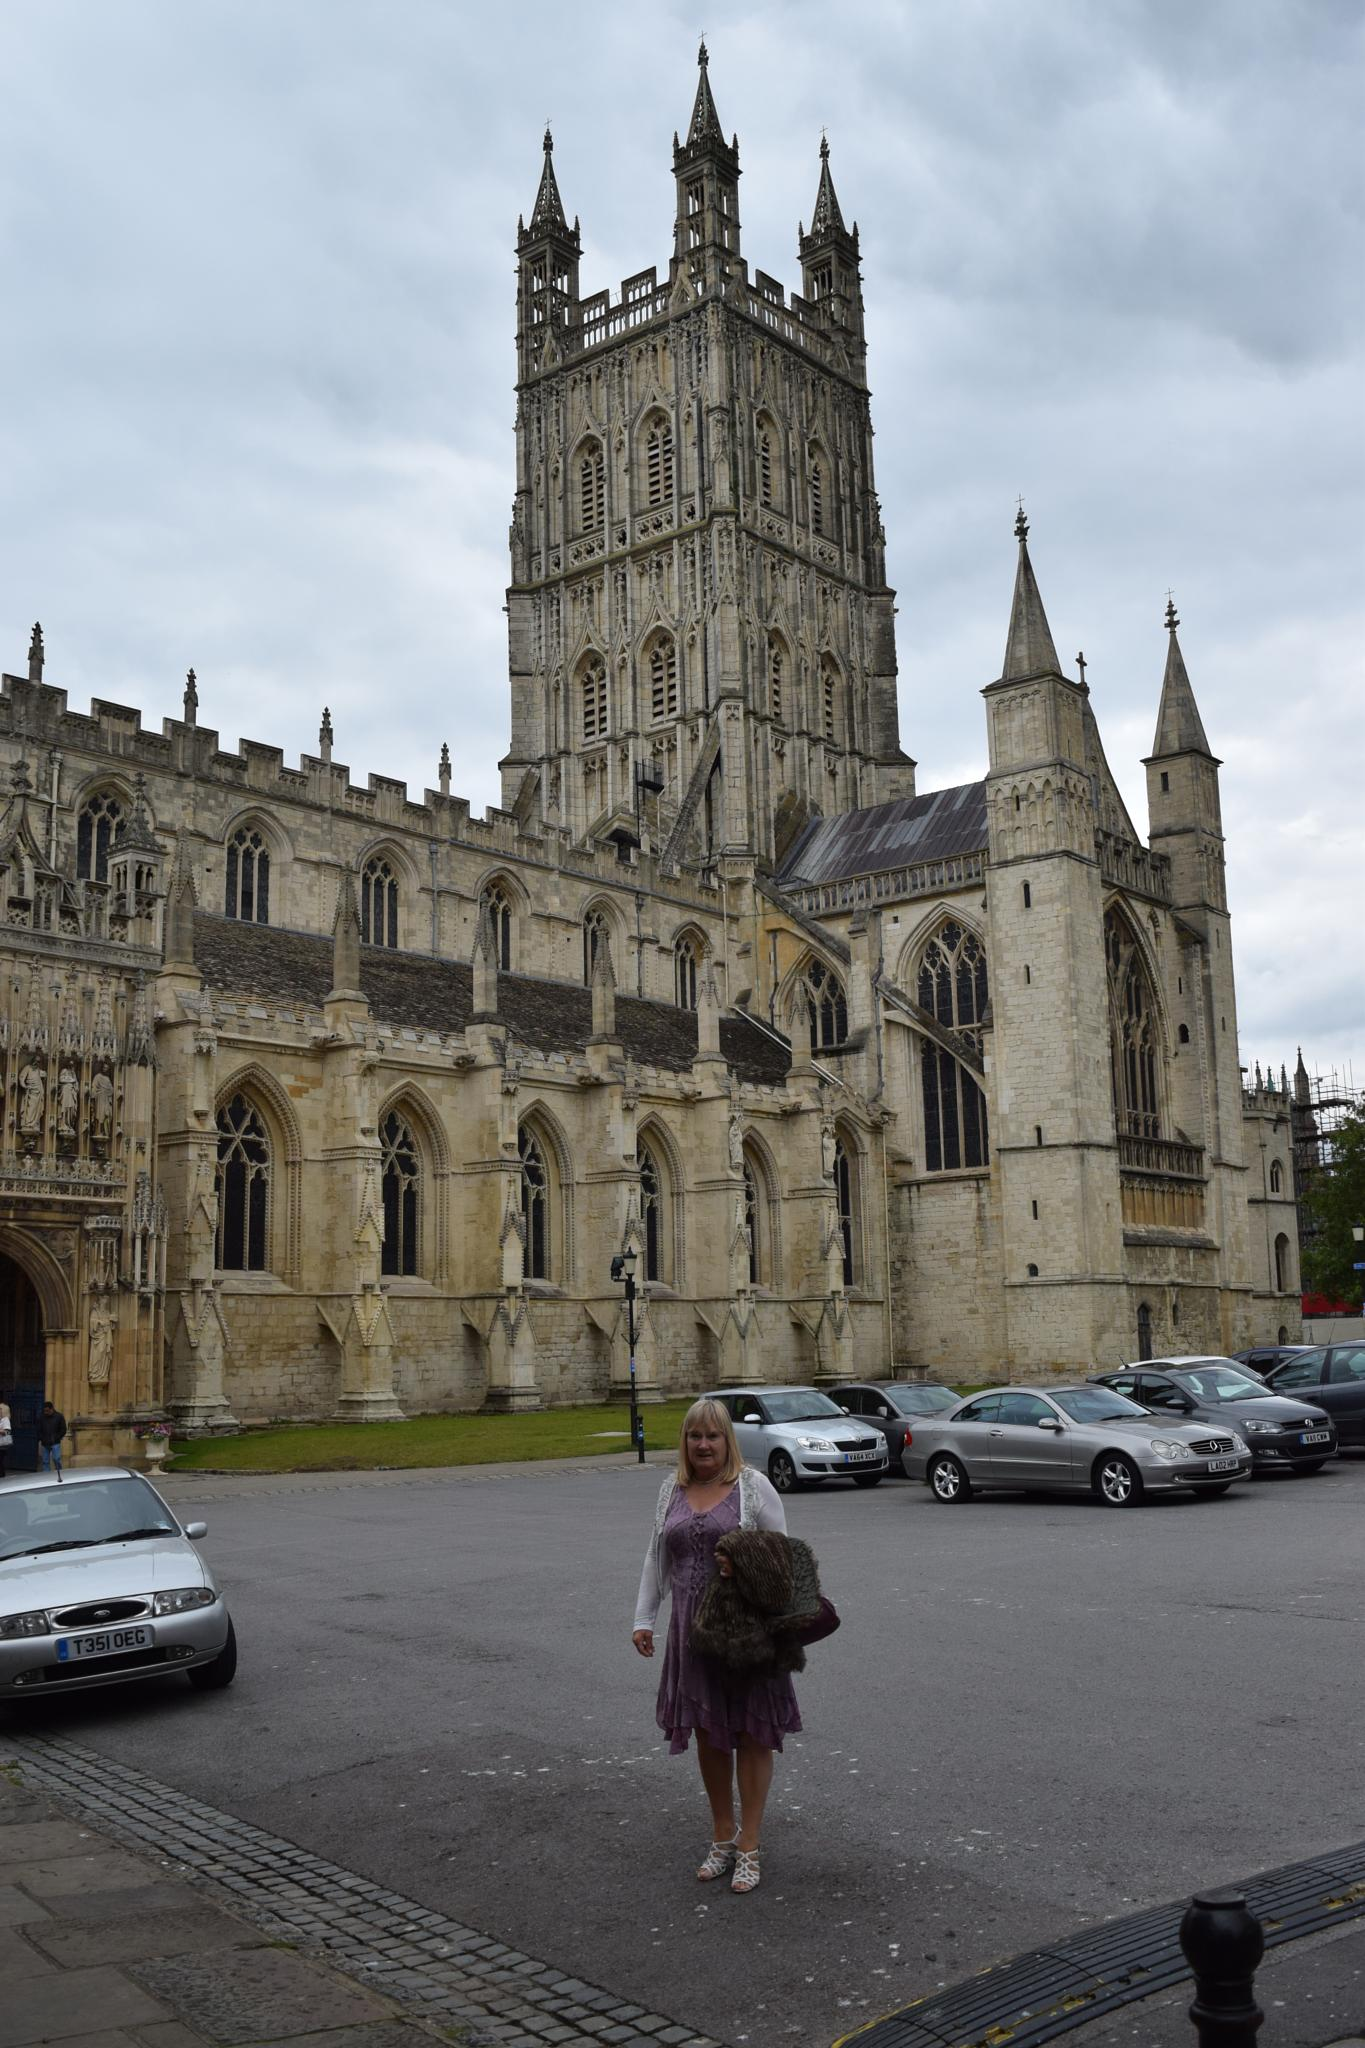 Gloucester Cathedral by Gwynboyo